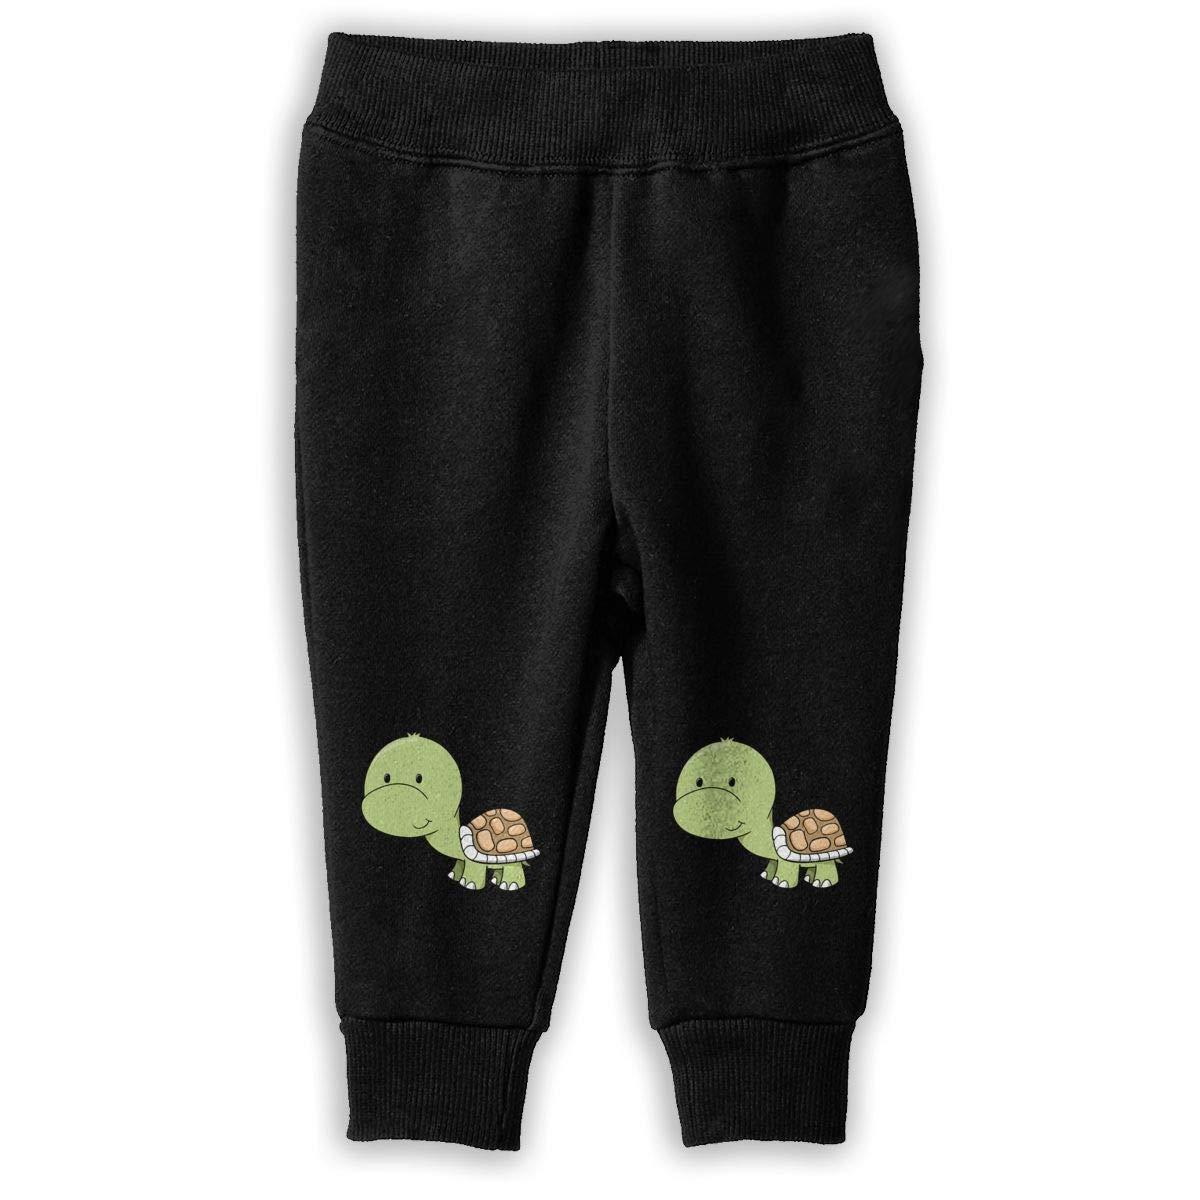 lu fangfangc Kids /& Toddler Turtle Joggers Cotton Sweatpants Fleece Pants for 2-6T